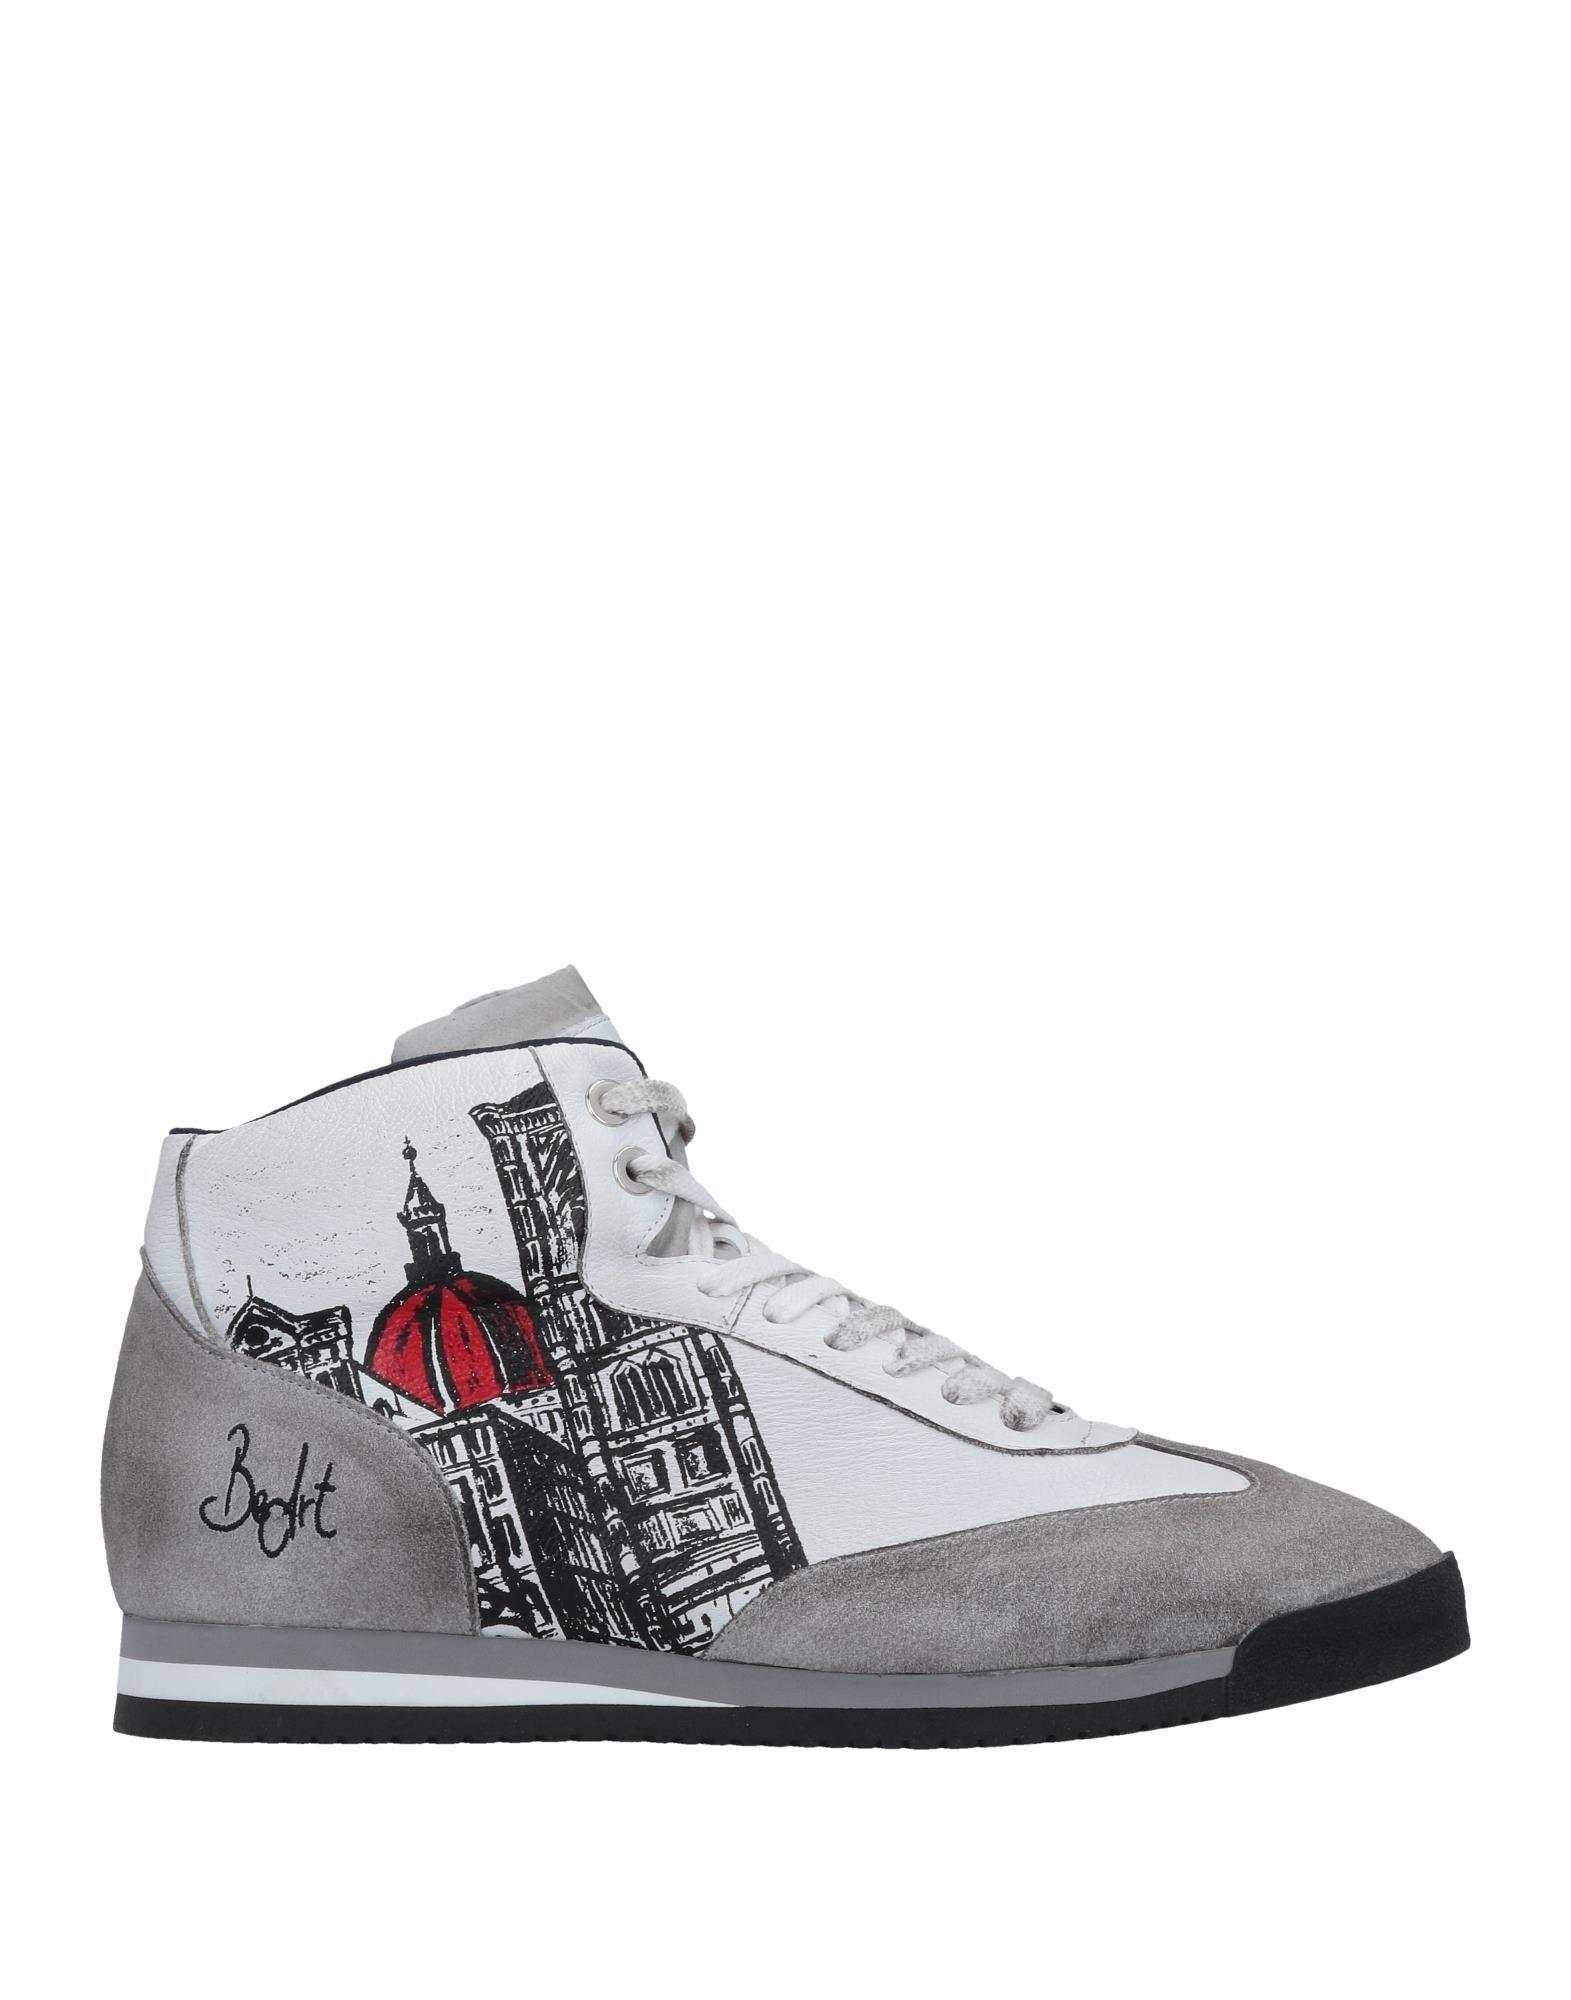 Moda Sneakers D'Acquasparta Uomo Uomo D'Acquasparta - 11510687HC b01a6e